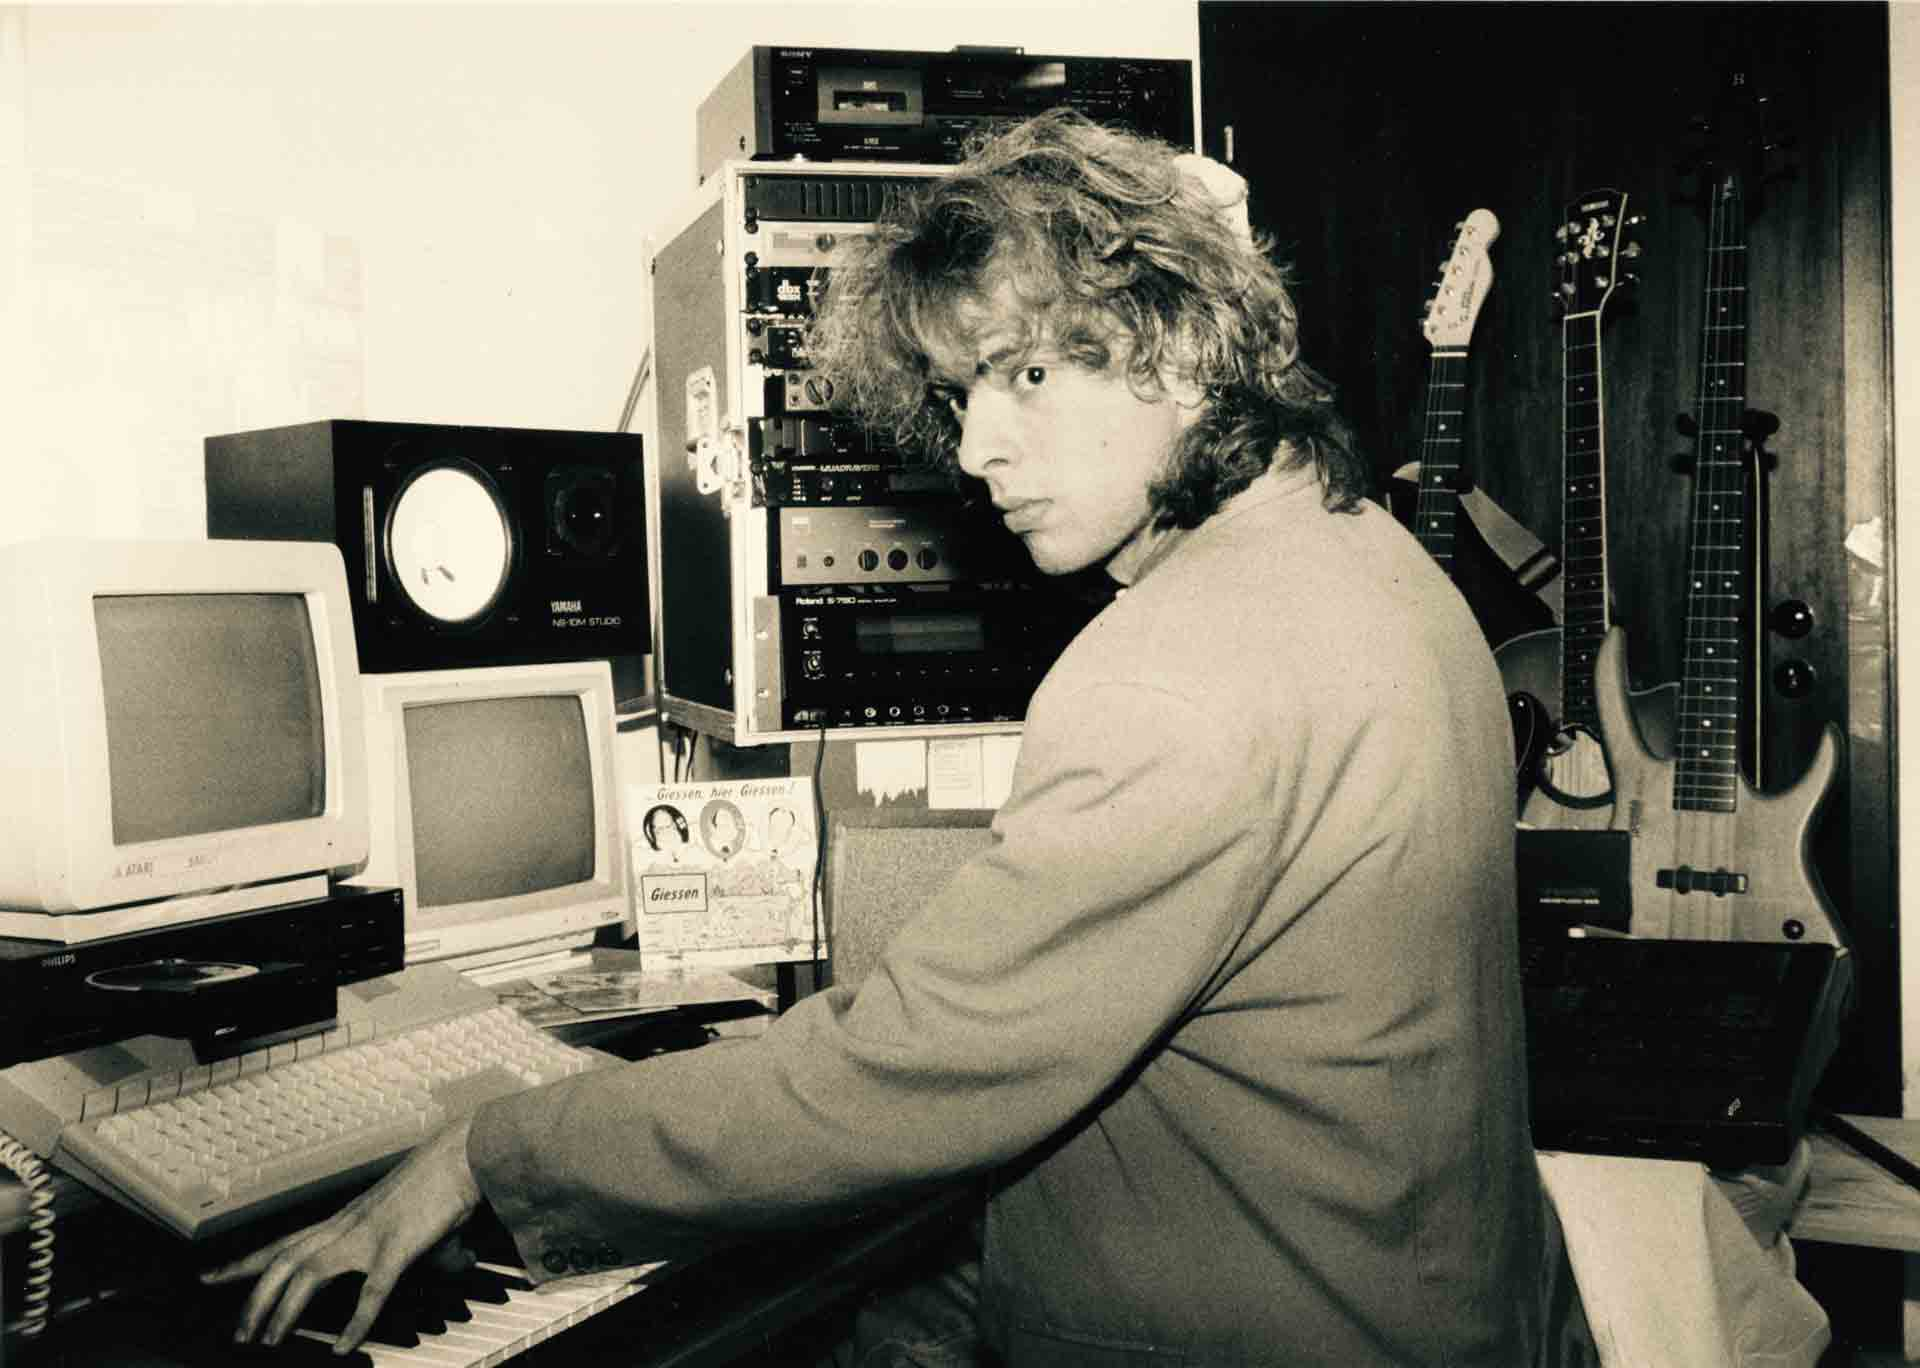 Marc Mozart 1992